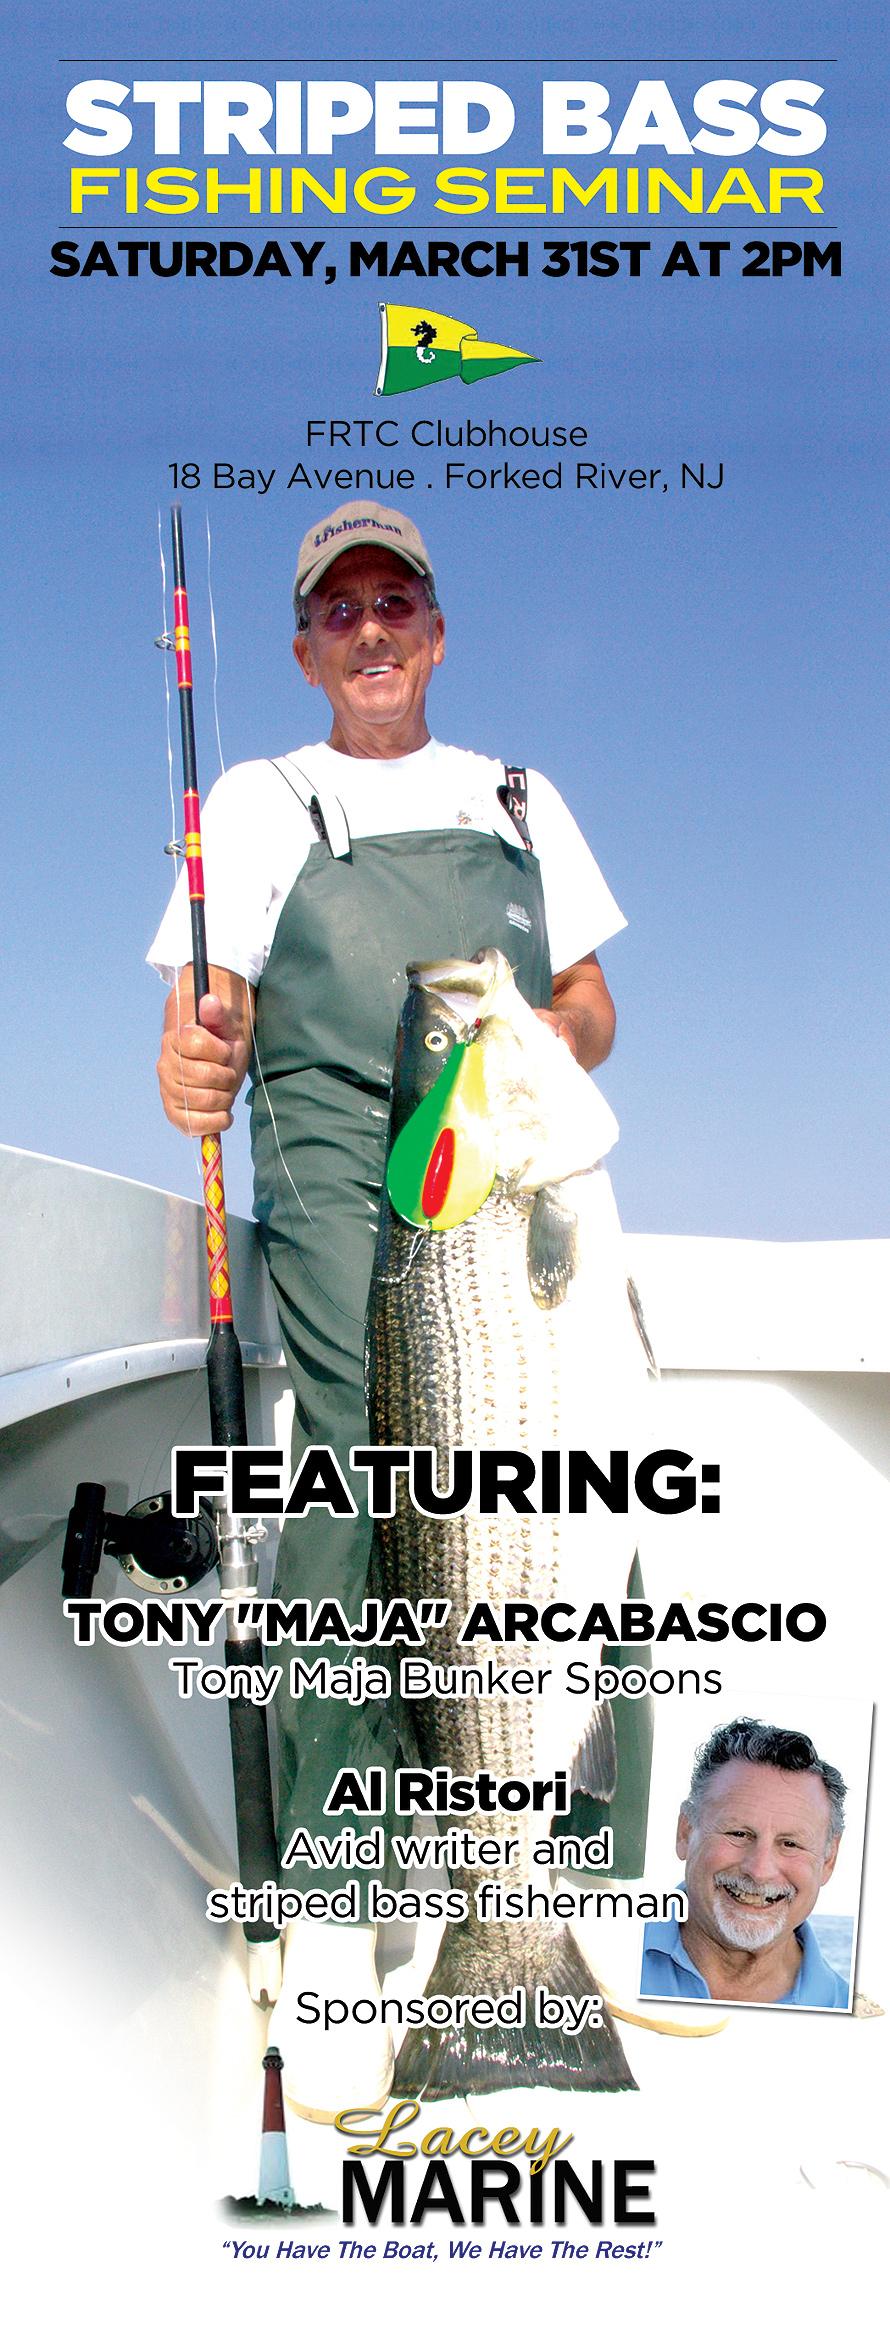 Striped Bass Fishing Seminar